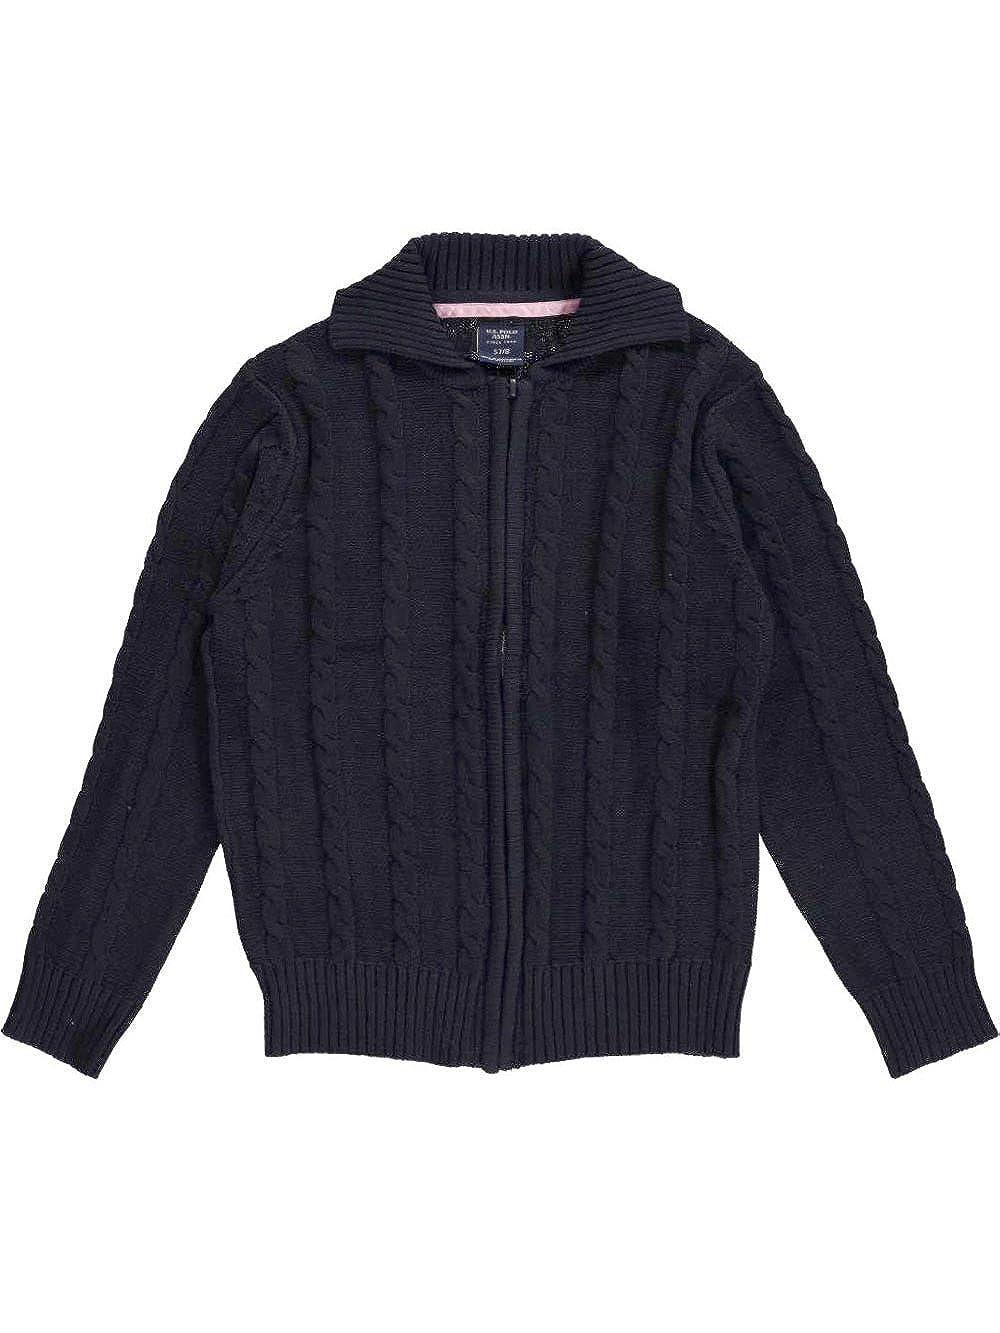 U.S. Polo Assn. Big Girls' Cable Comfort Cardigan